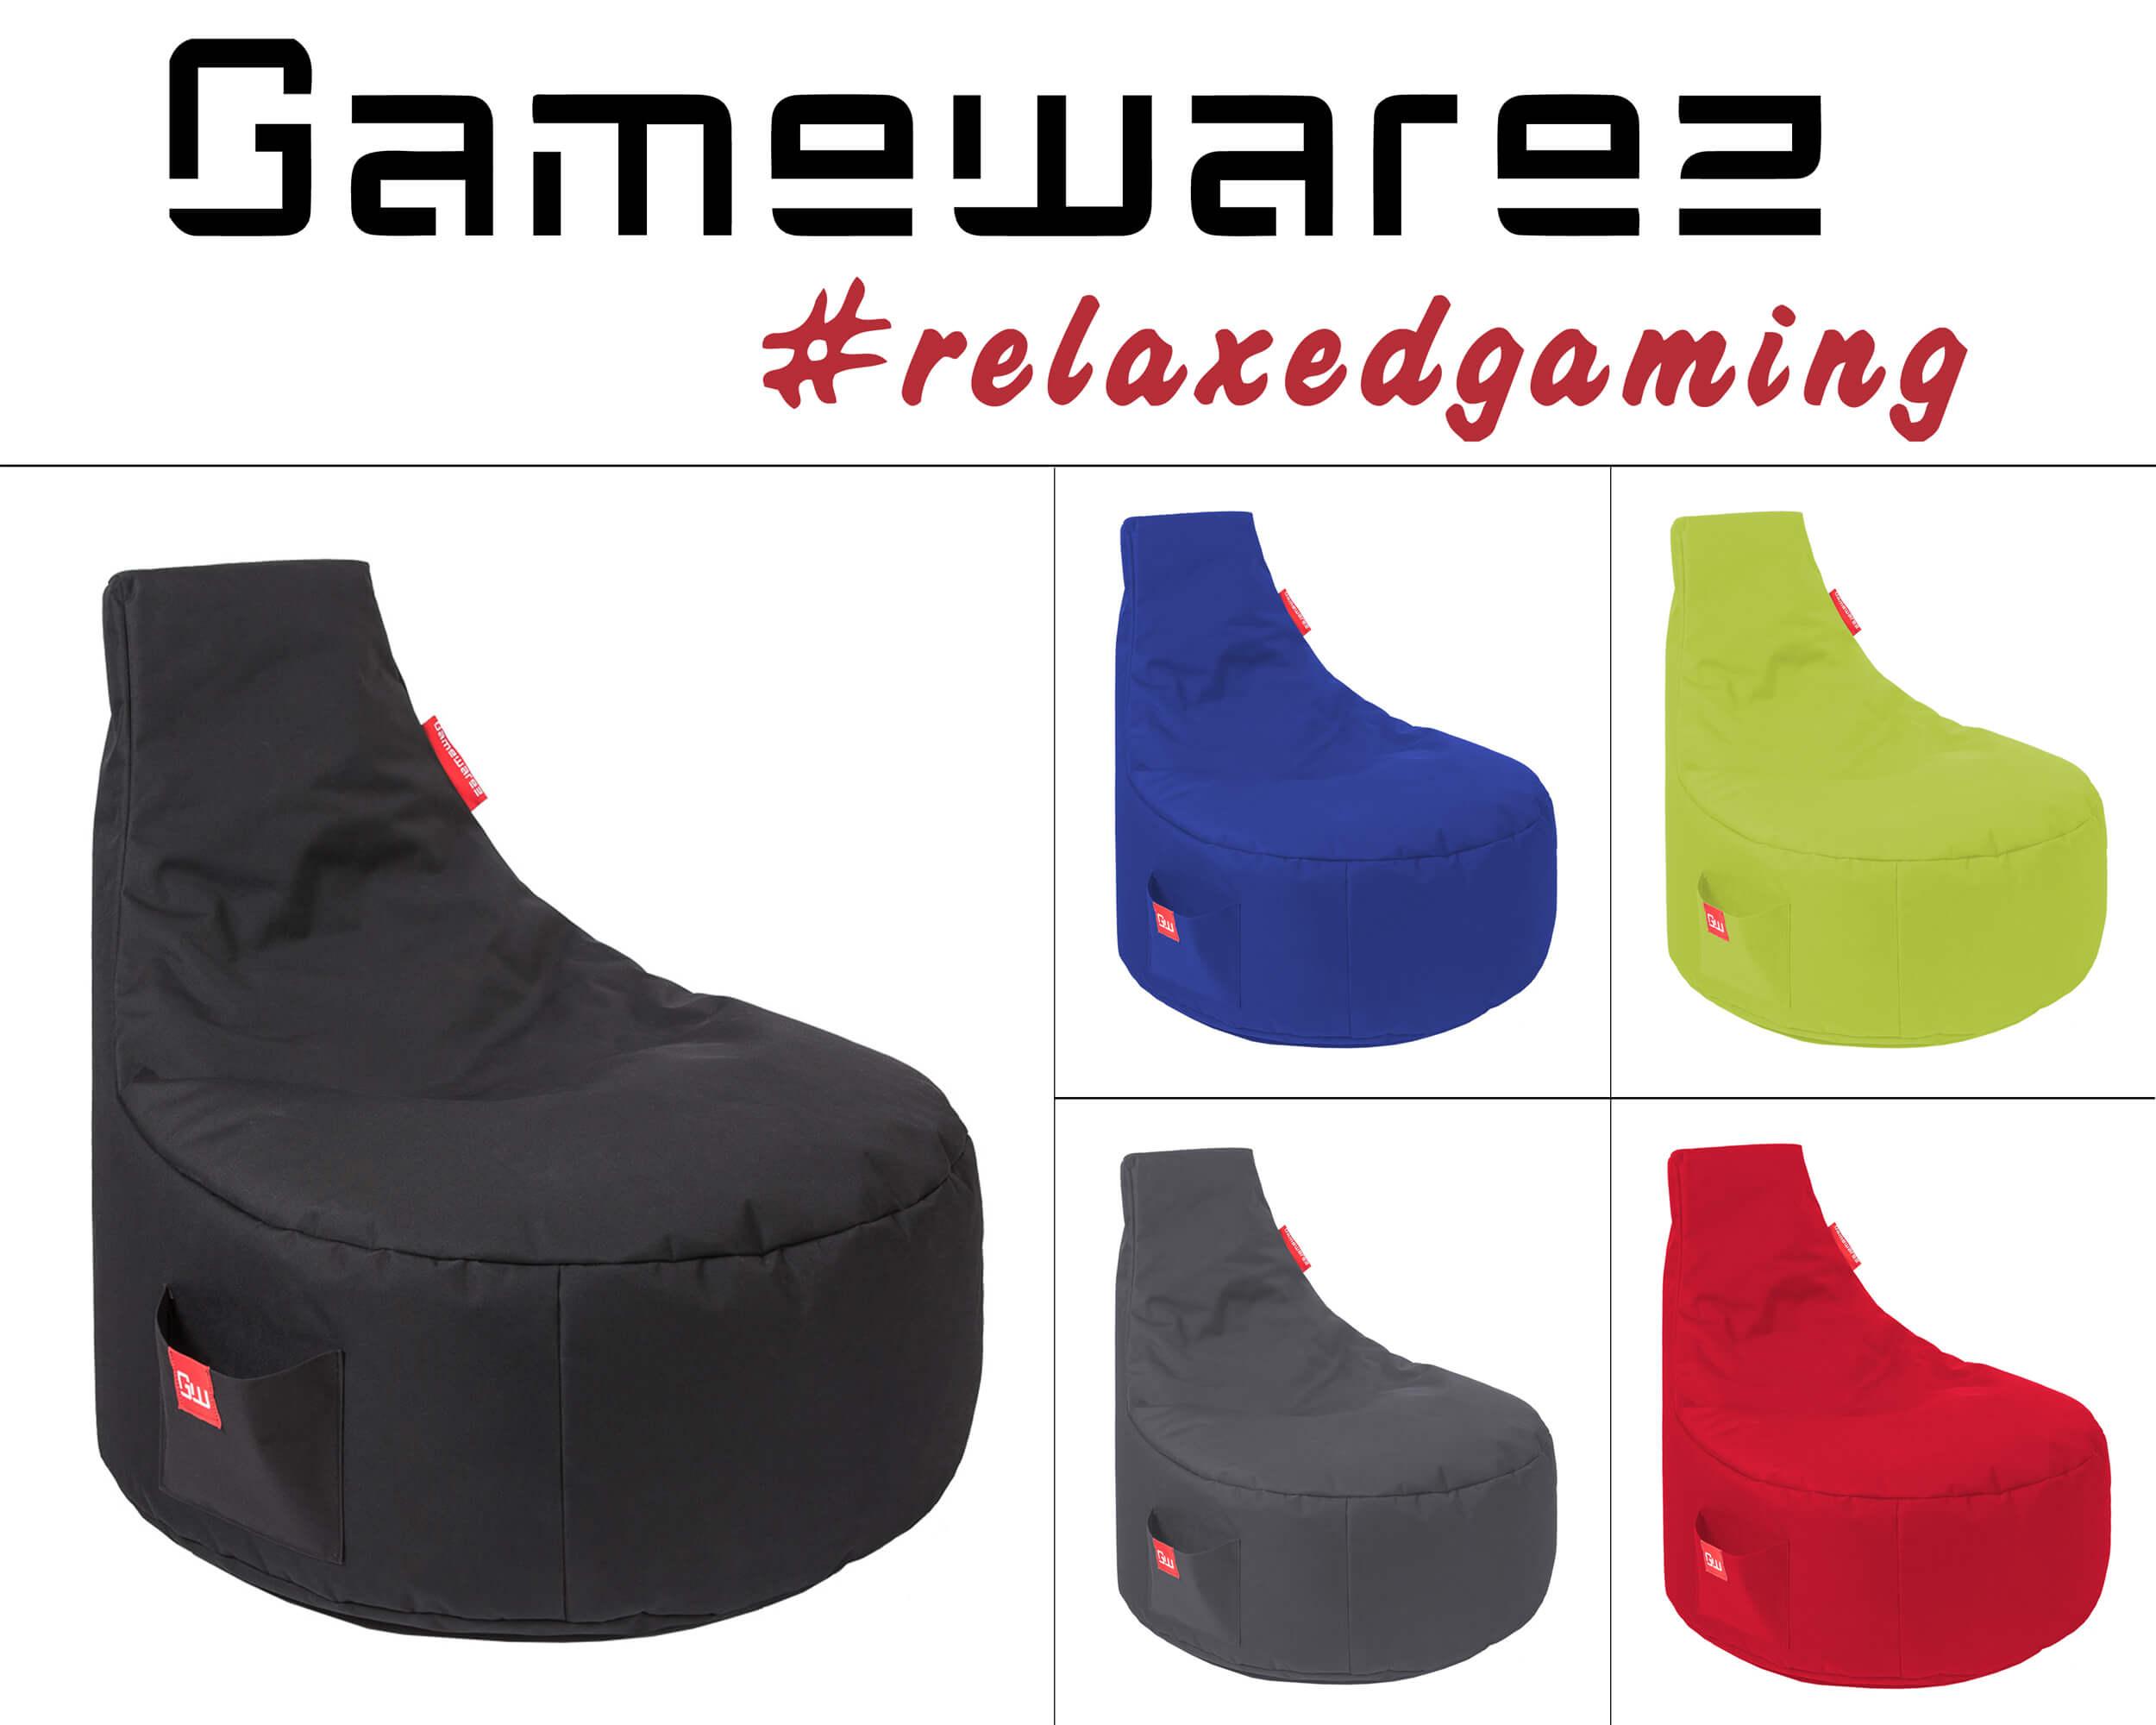 Gamewarez Sitzsack Classic Gamer Sessel Beanbag Lounge Chillout Sack XBOX PS4